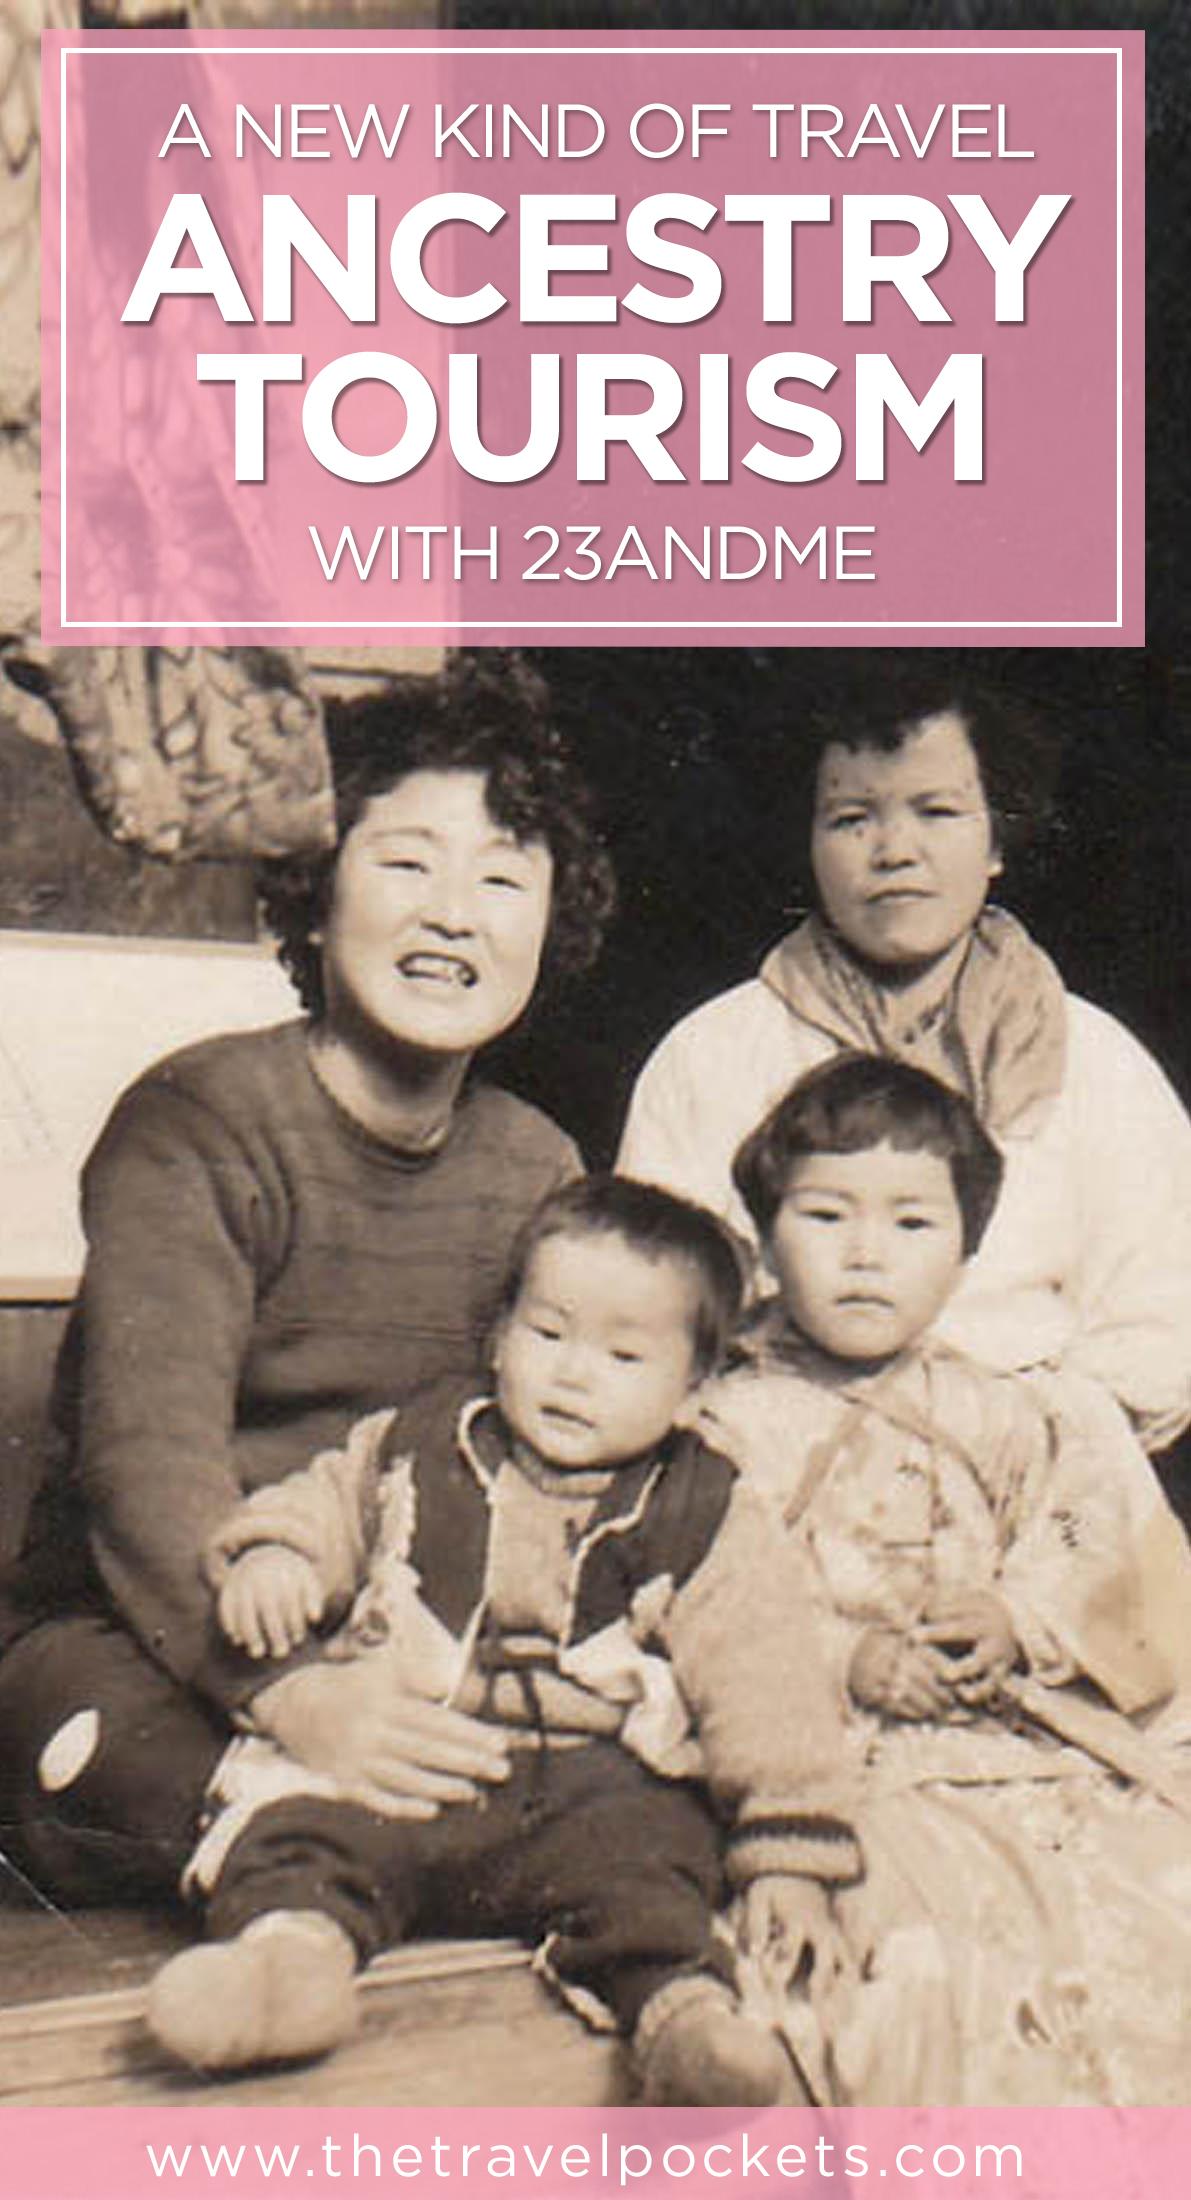 23andMe+++www.thetravelpockets.com